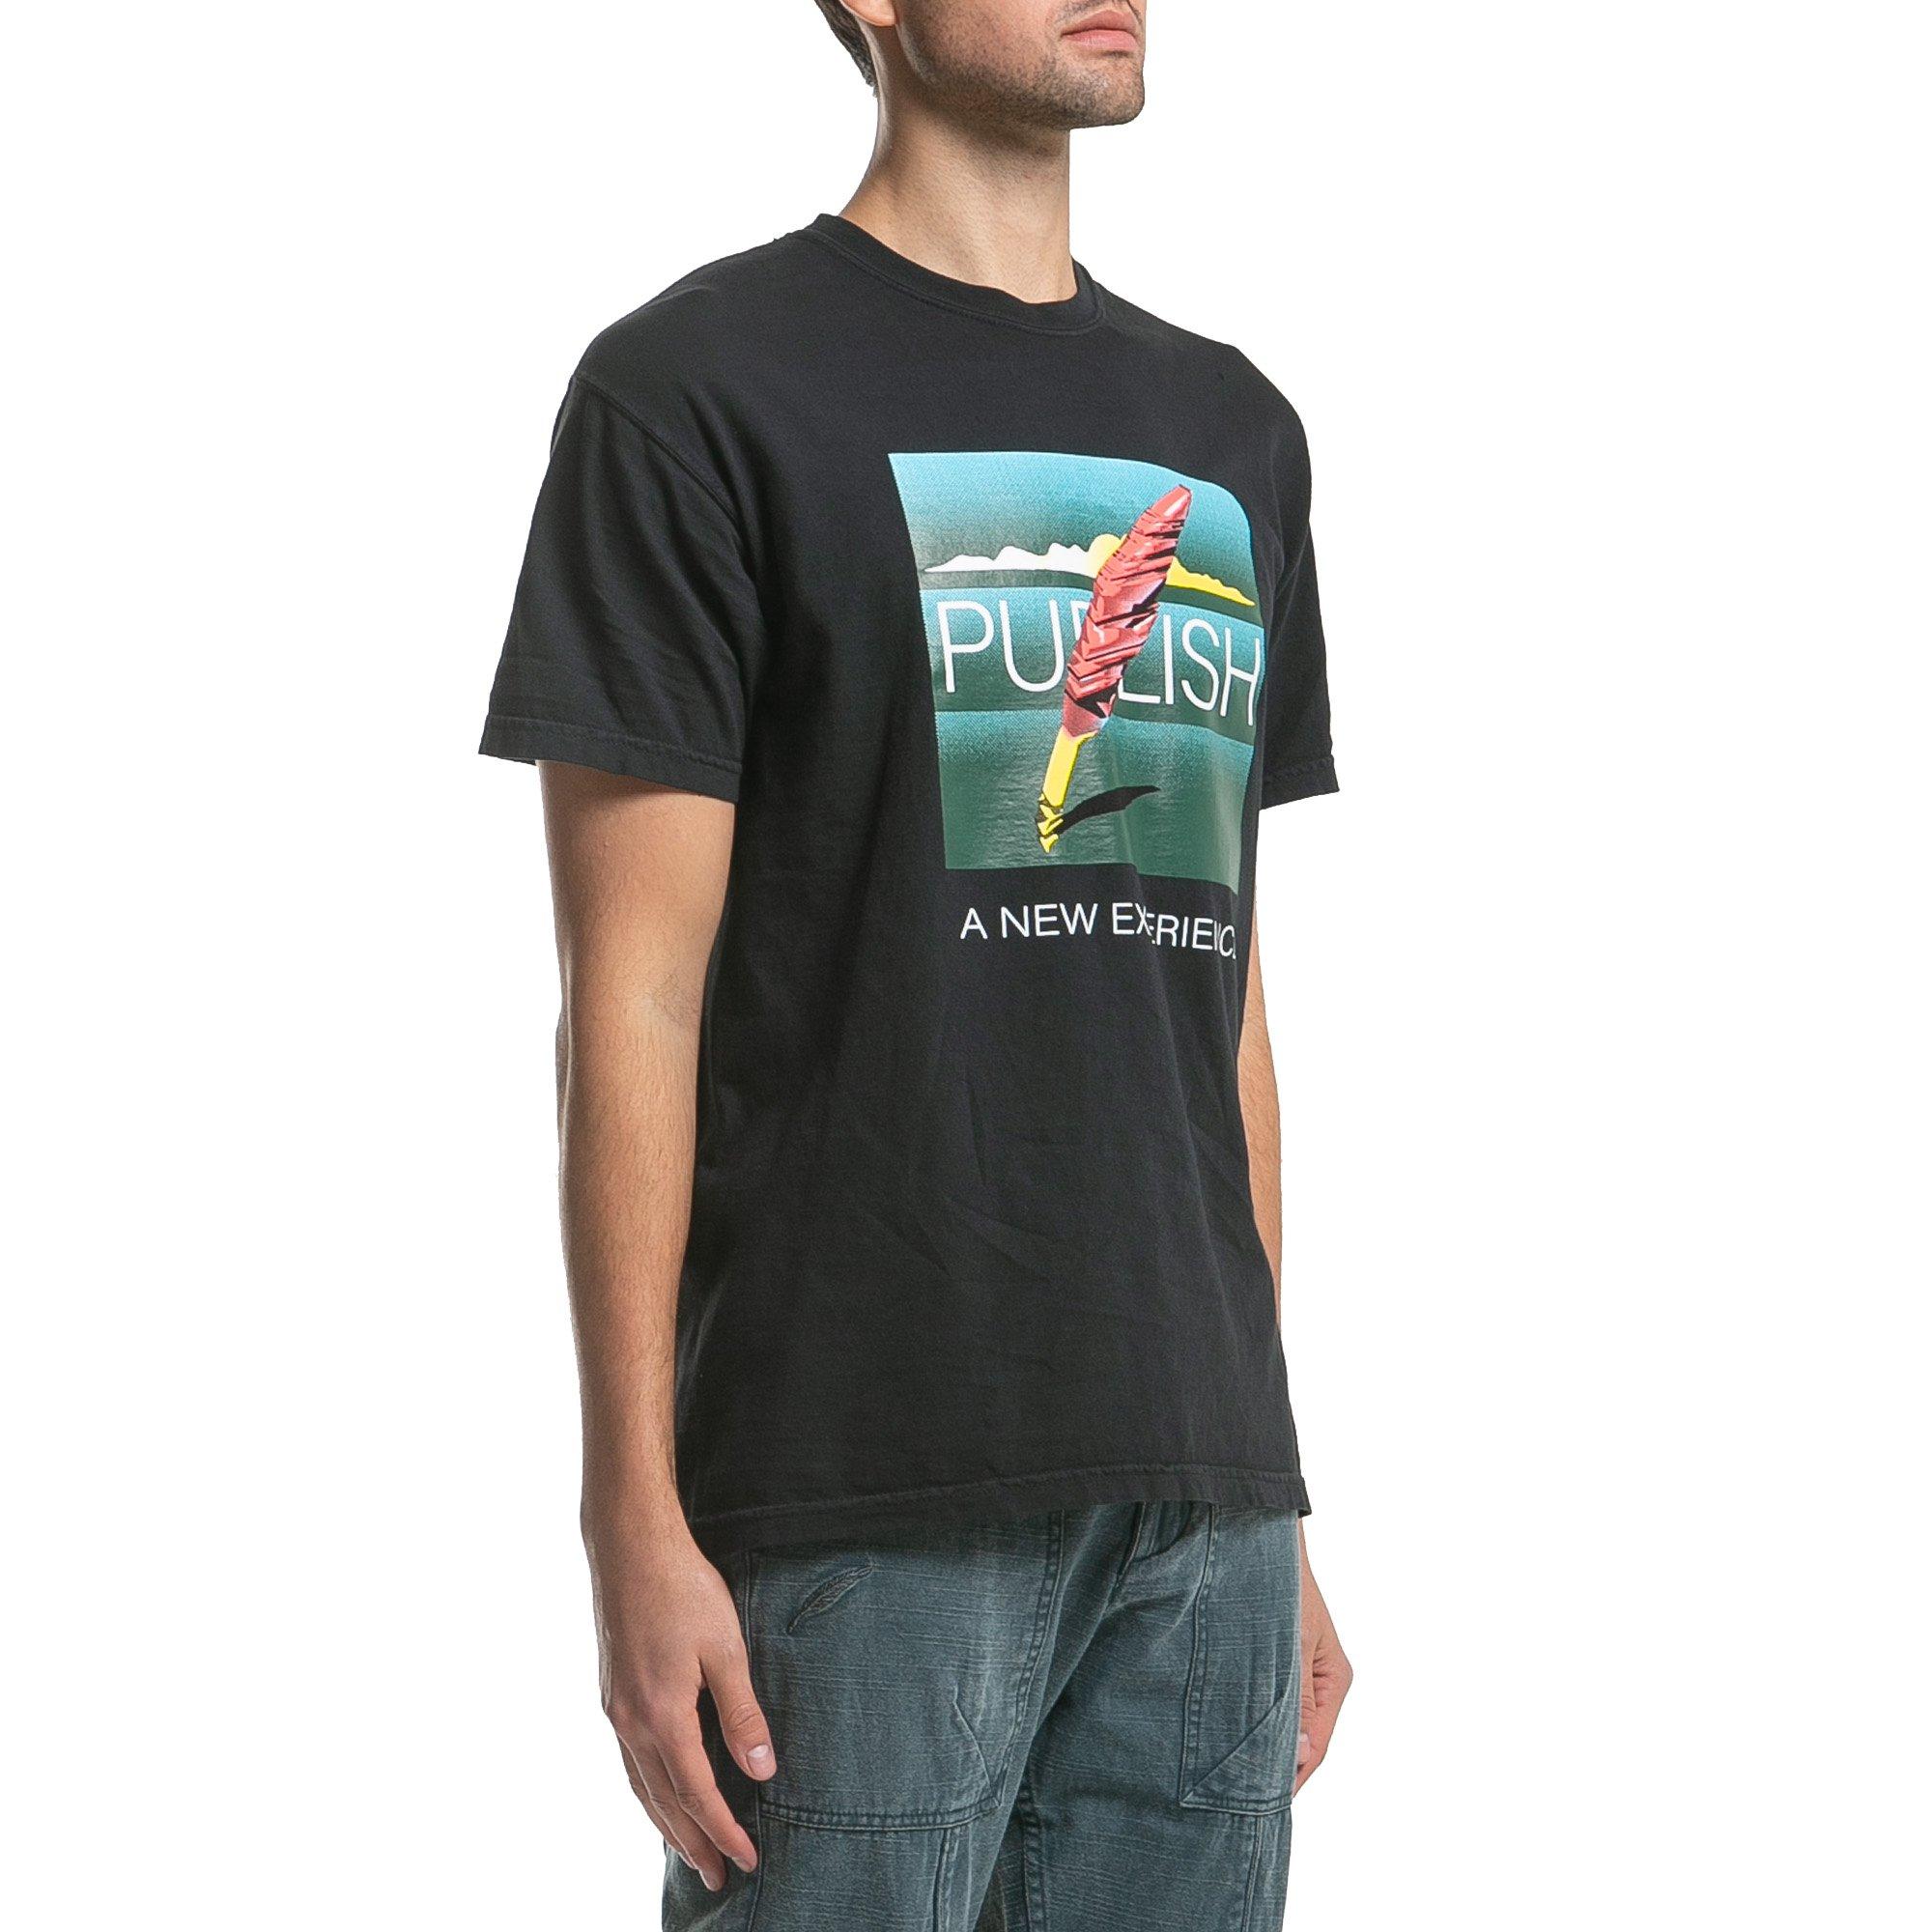 【PUBLISH BRAND/パブリッシュブランド】A NEW EXPERIENCE Tシャツ / BLACK